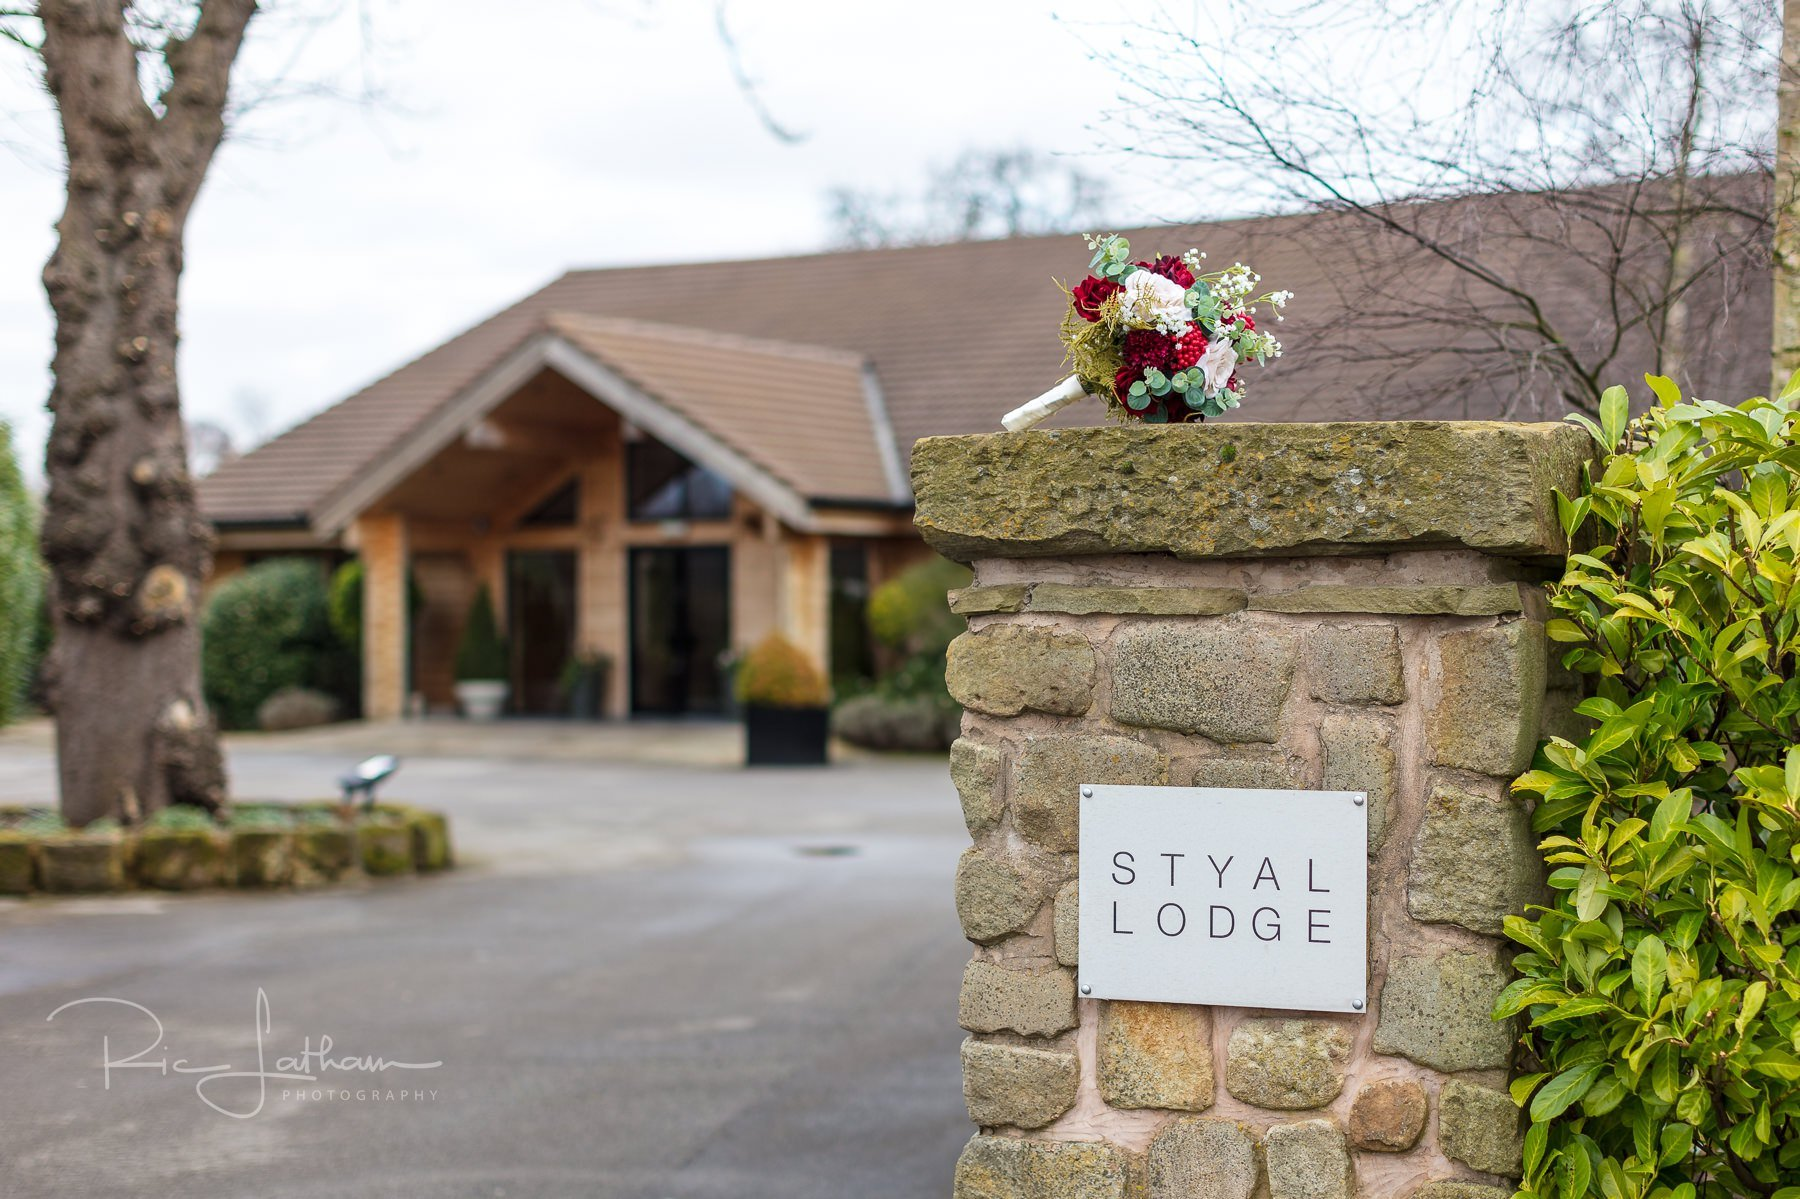 styal-lodge-wedding-venue